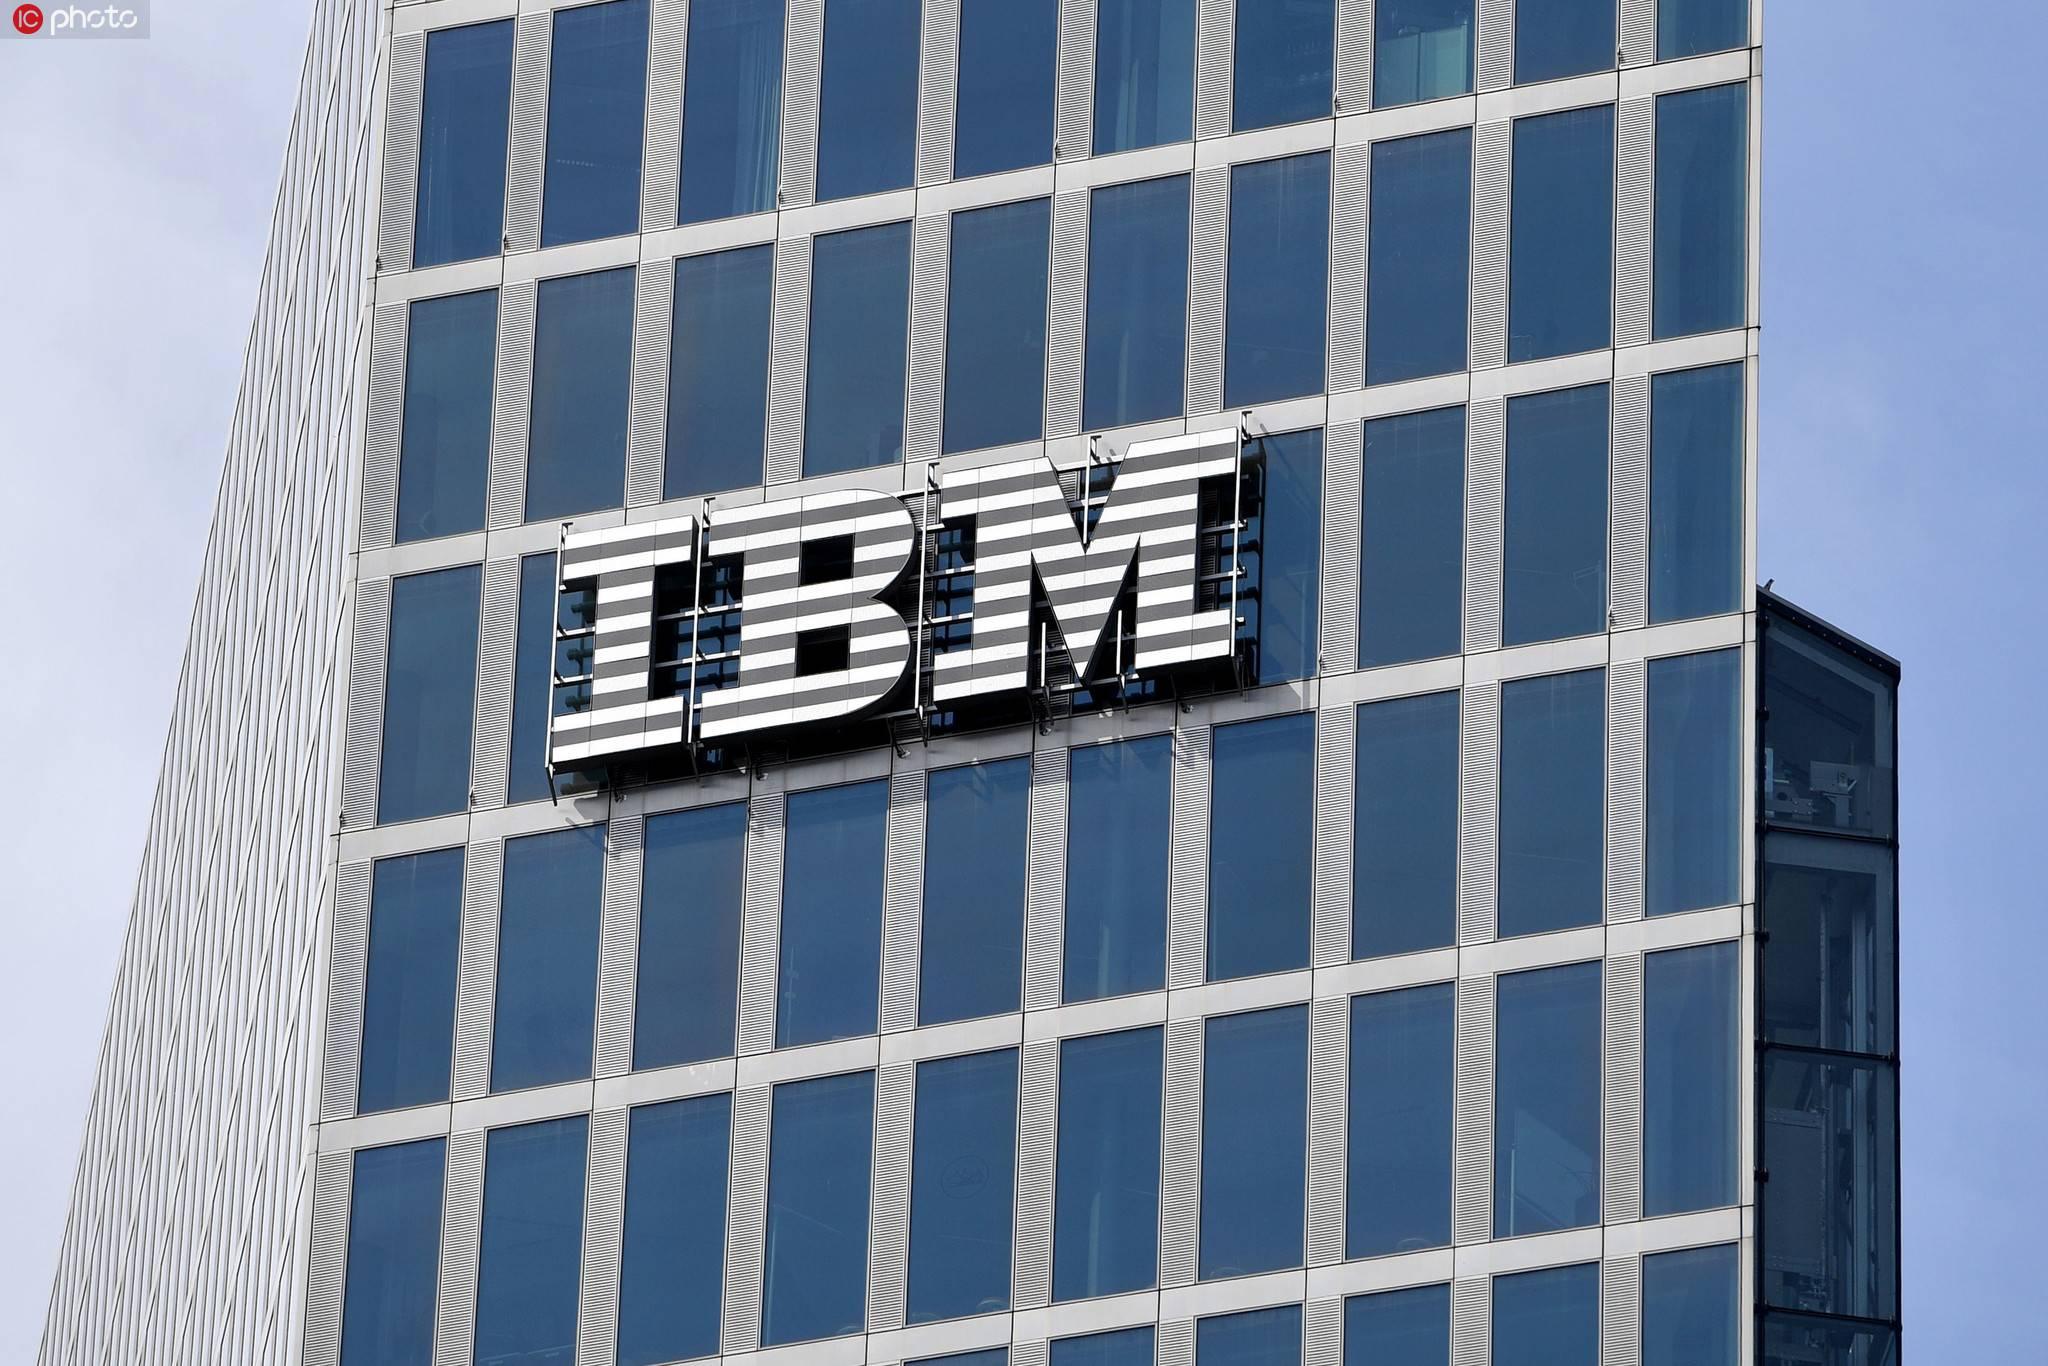 AT&T与IBM数十亿美元合作背后,什么最先浮出水面?